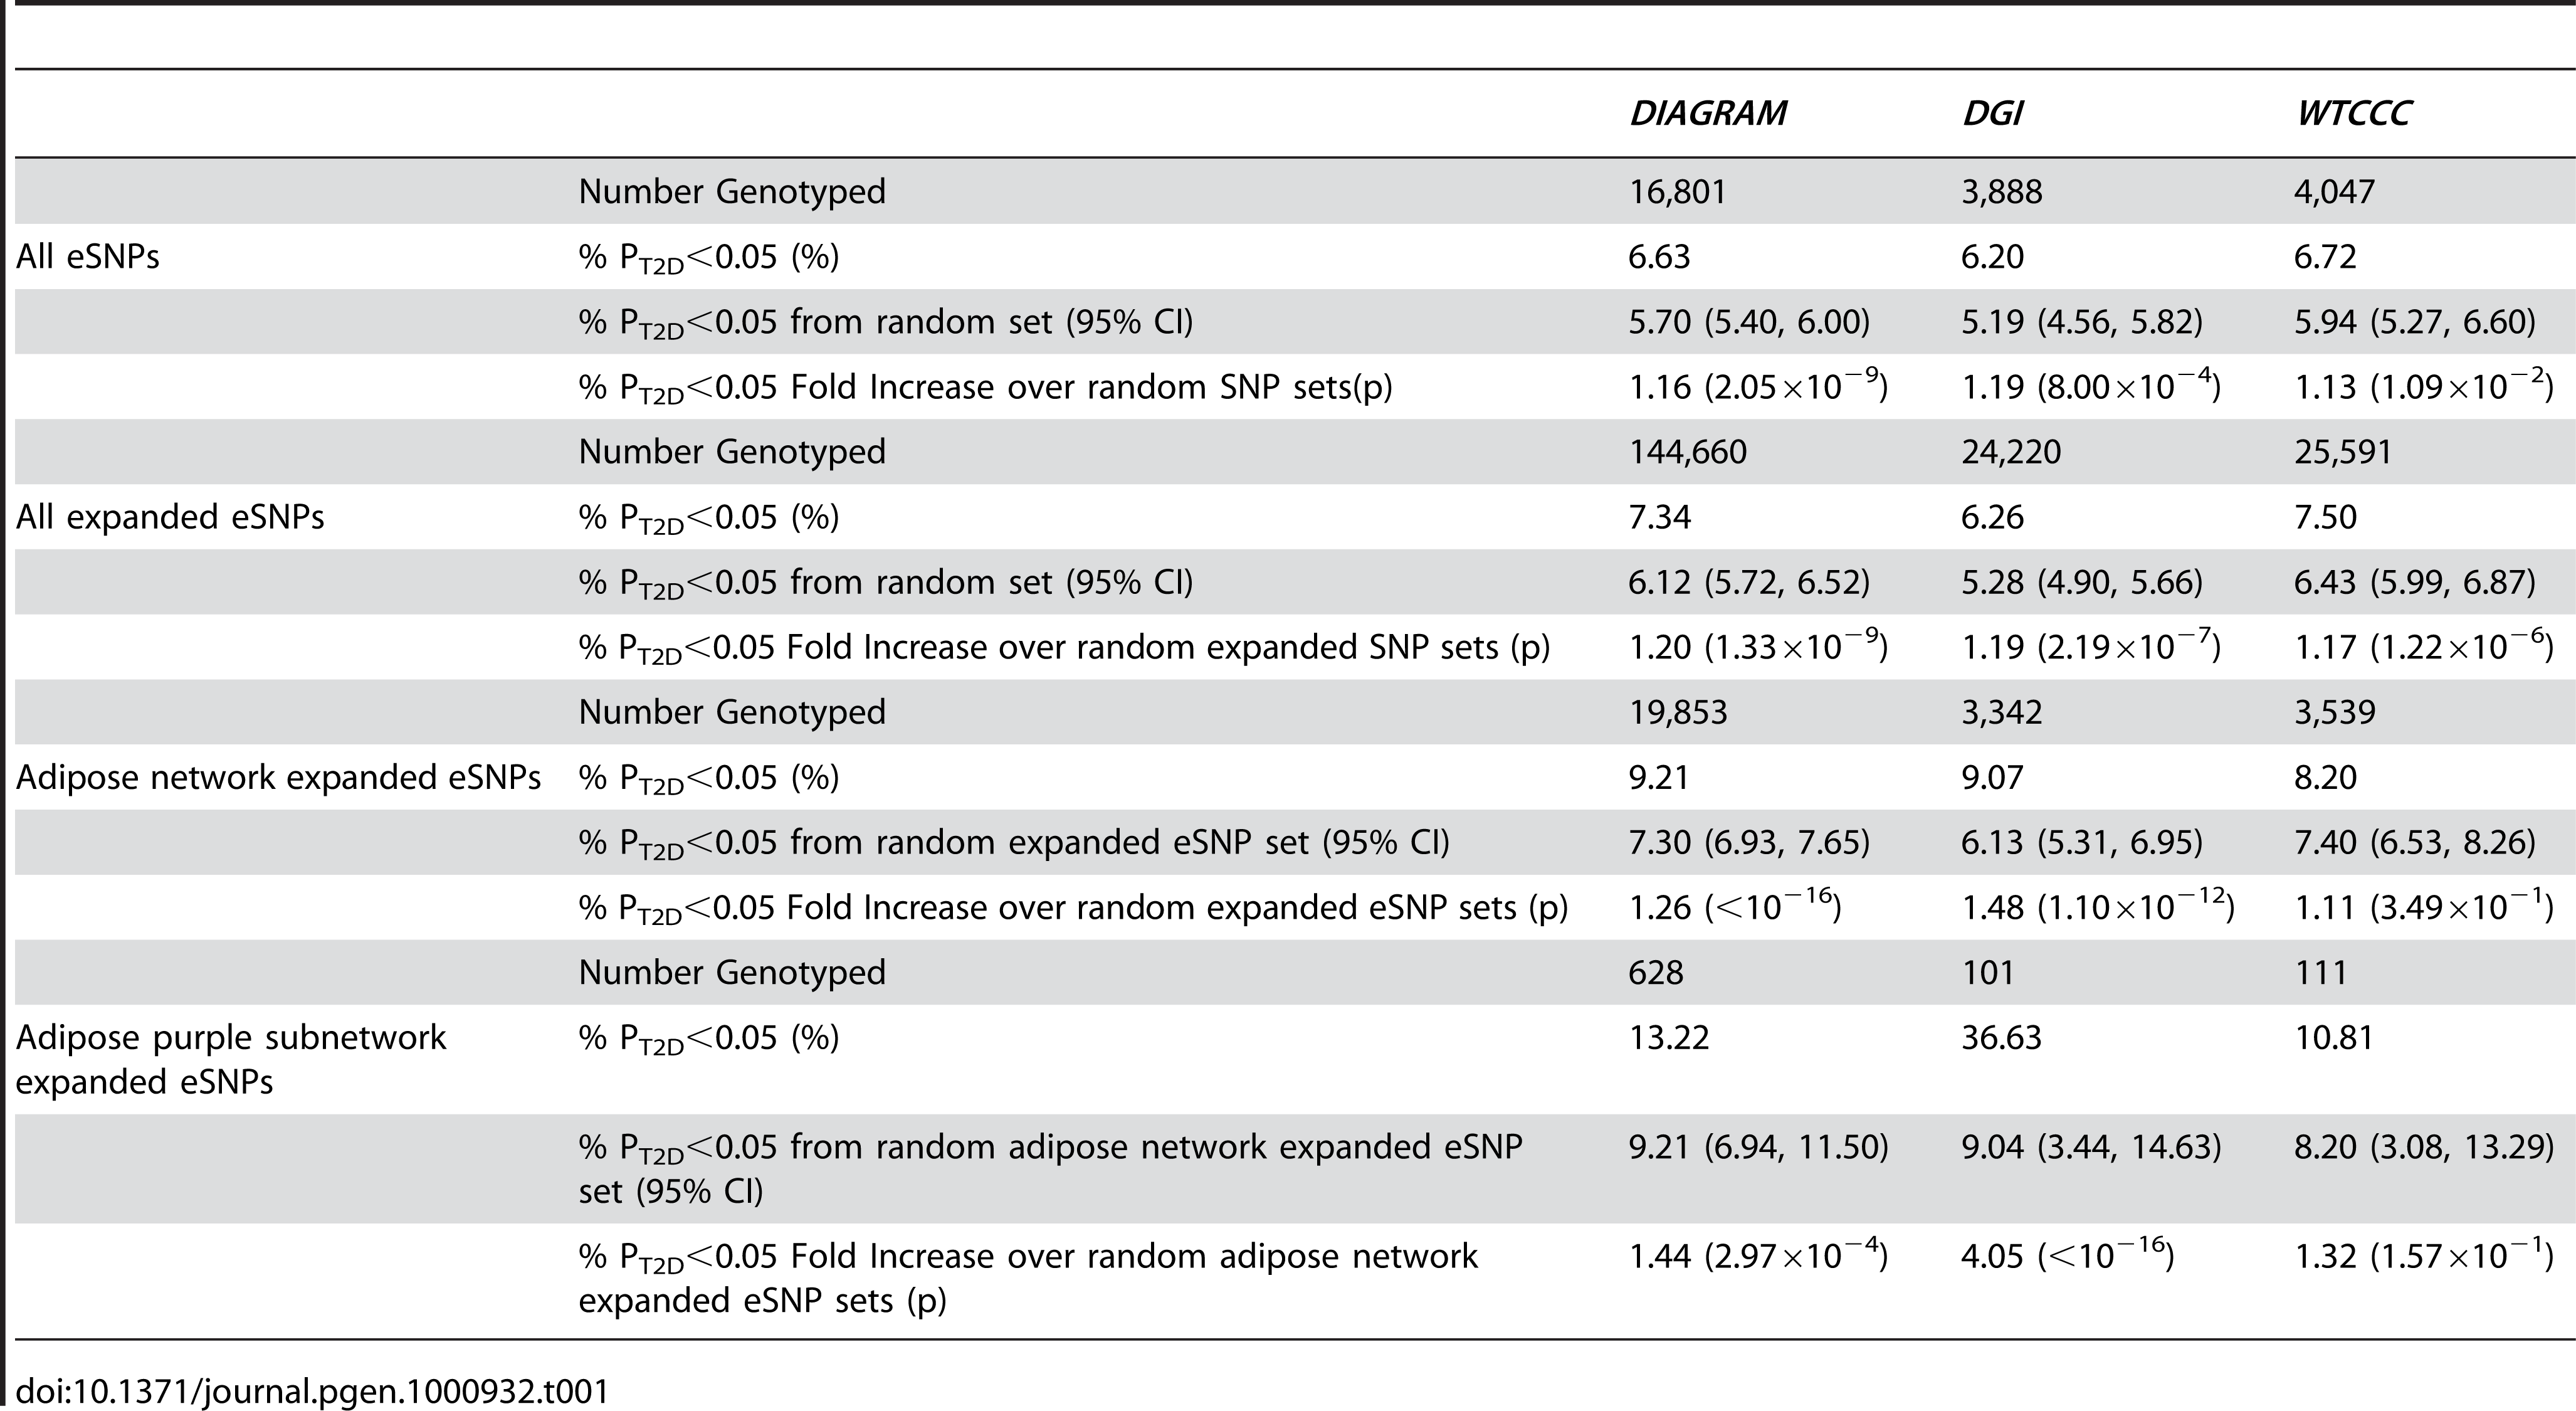 eSNP Set Enrichment Summary for the DIAGRAM, DGI and WTCCC GWAS.